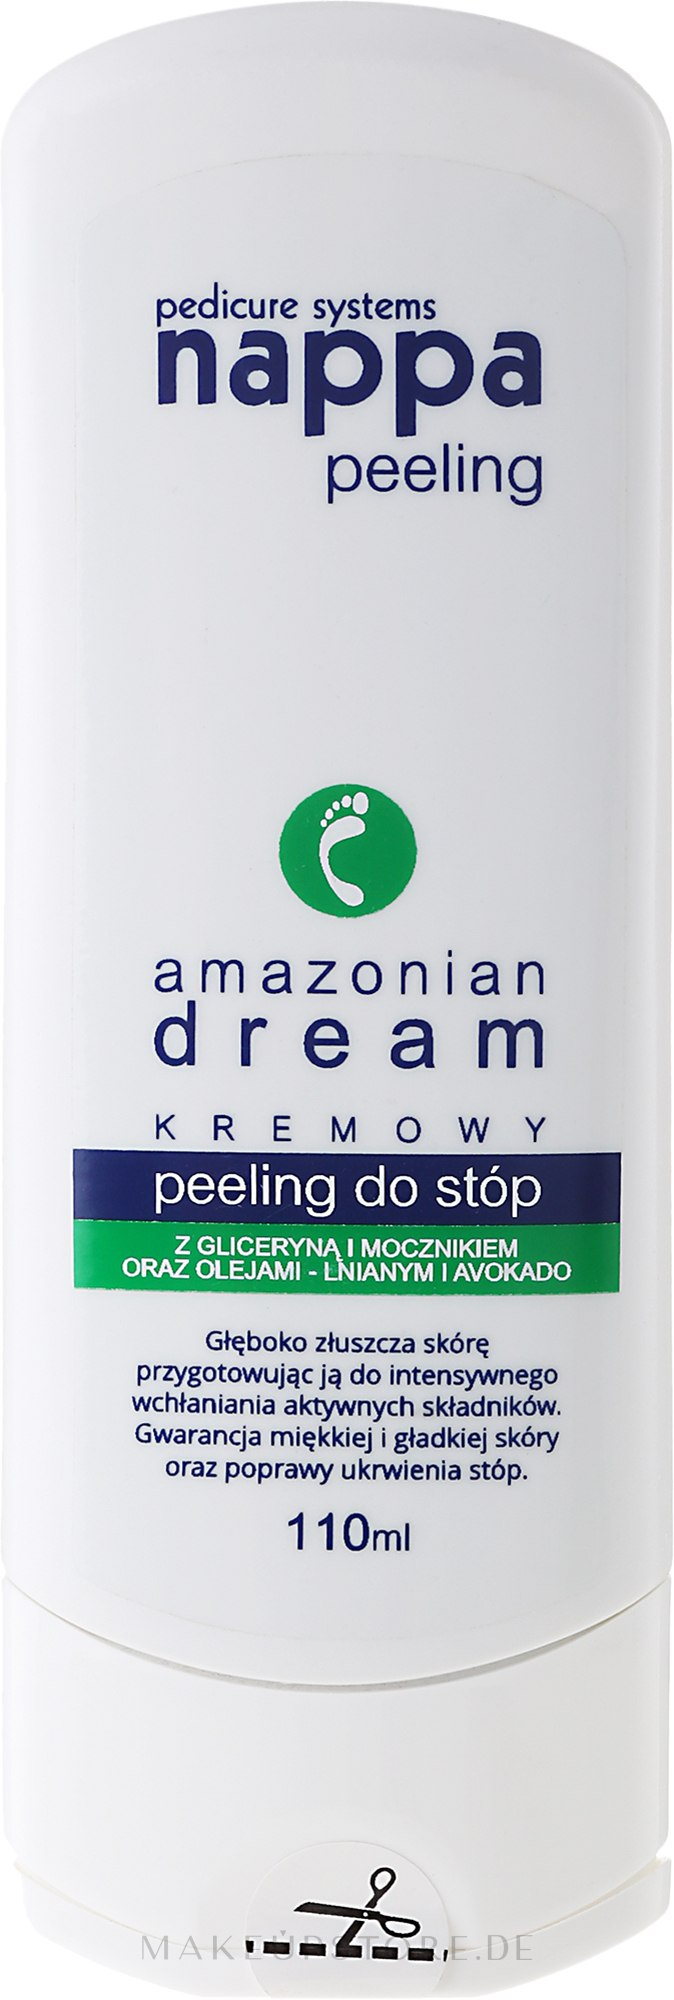 Cremiges Fußpeeling Amazonian Dream mit Glyzerin und Avocado - Silcare Nappa Creamy Foot Peeling Amazonian Dream — Bild 110 ml